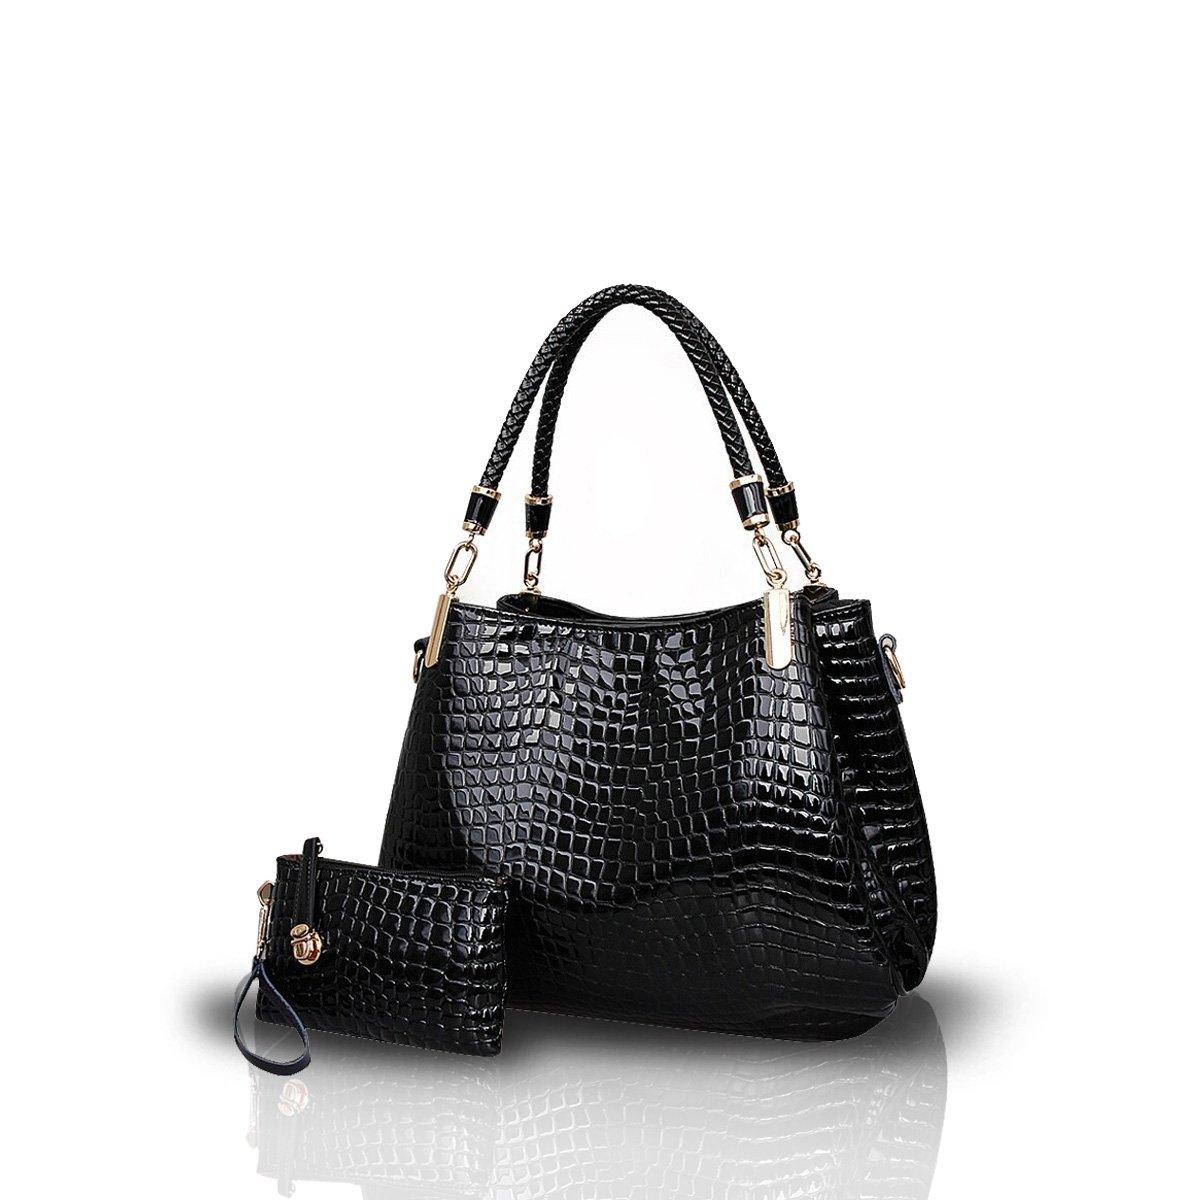 Nicole&Doris New Crocodile Grain PU Leather Women/Ladies Shoulder Bag Handbag Crossbody Totes Large Bag Black